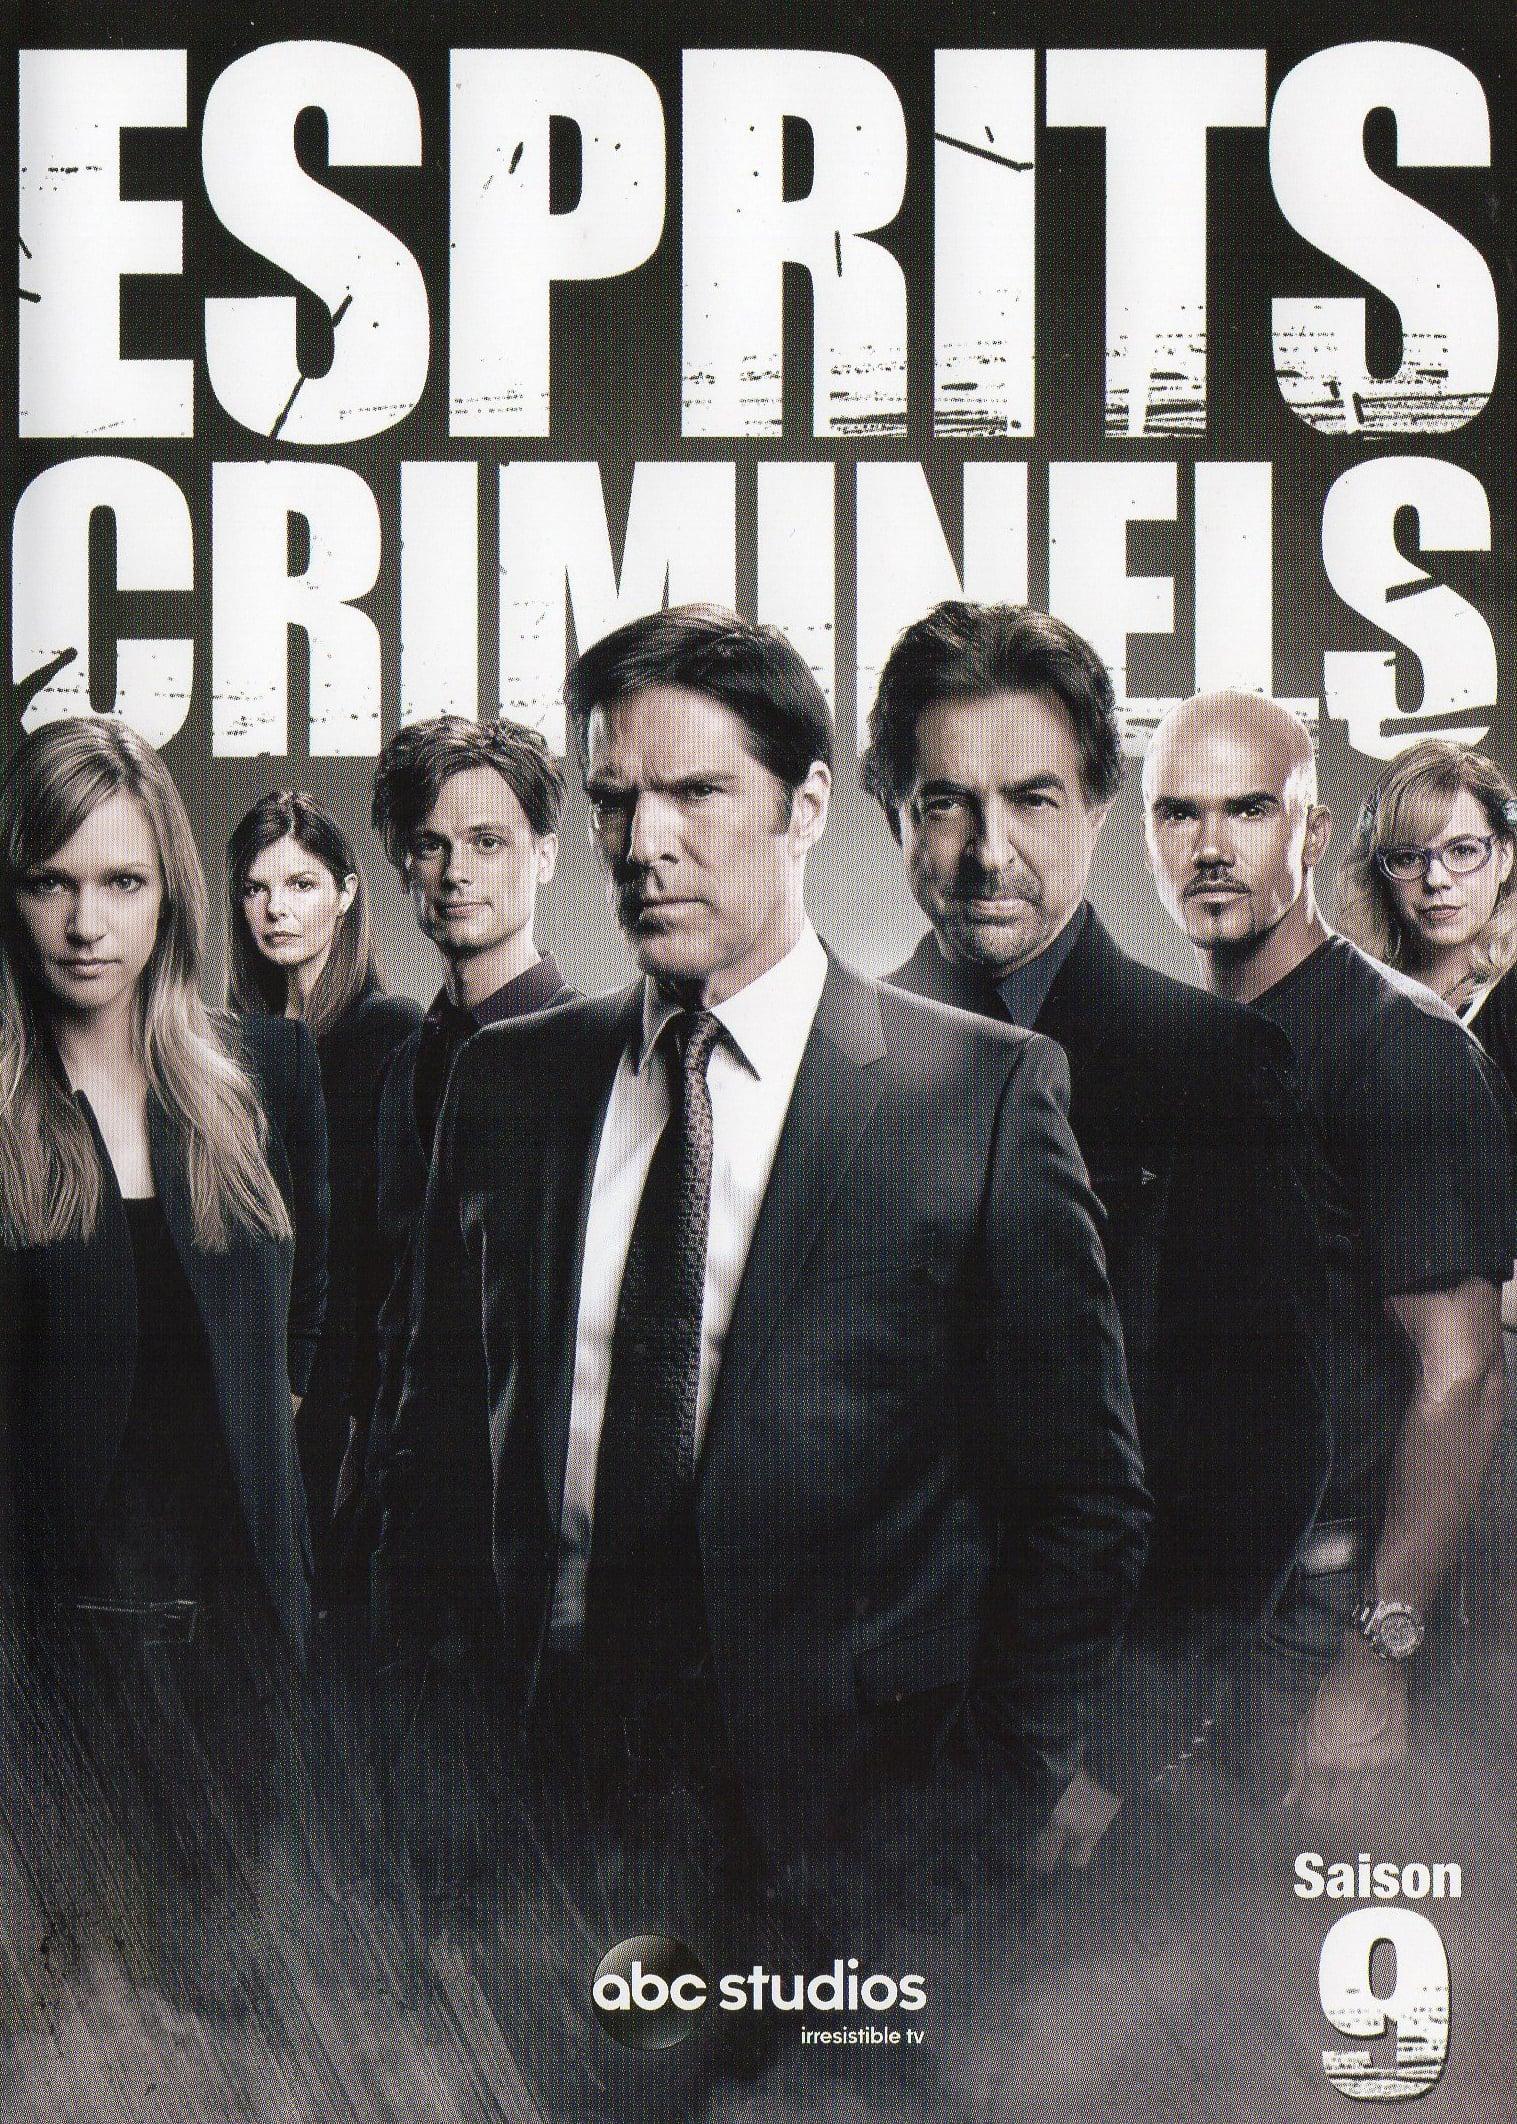 Image ncis-los-angeles-26630-episode-8-season-10.jpg